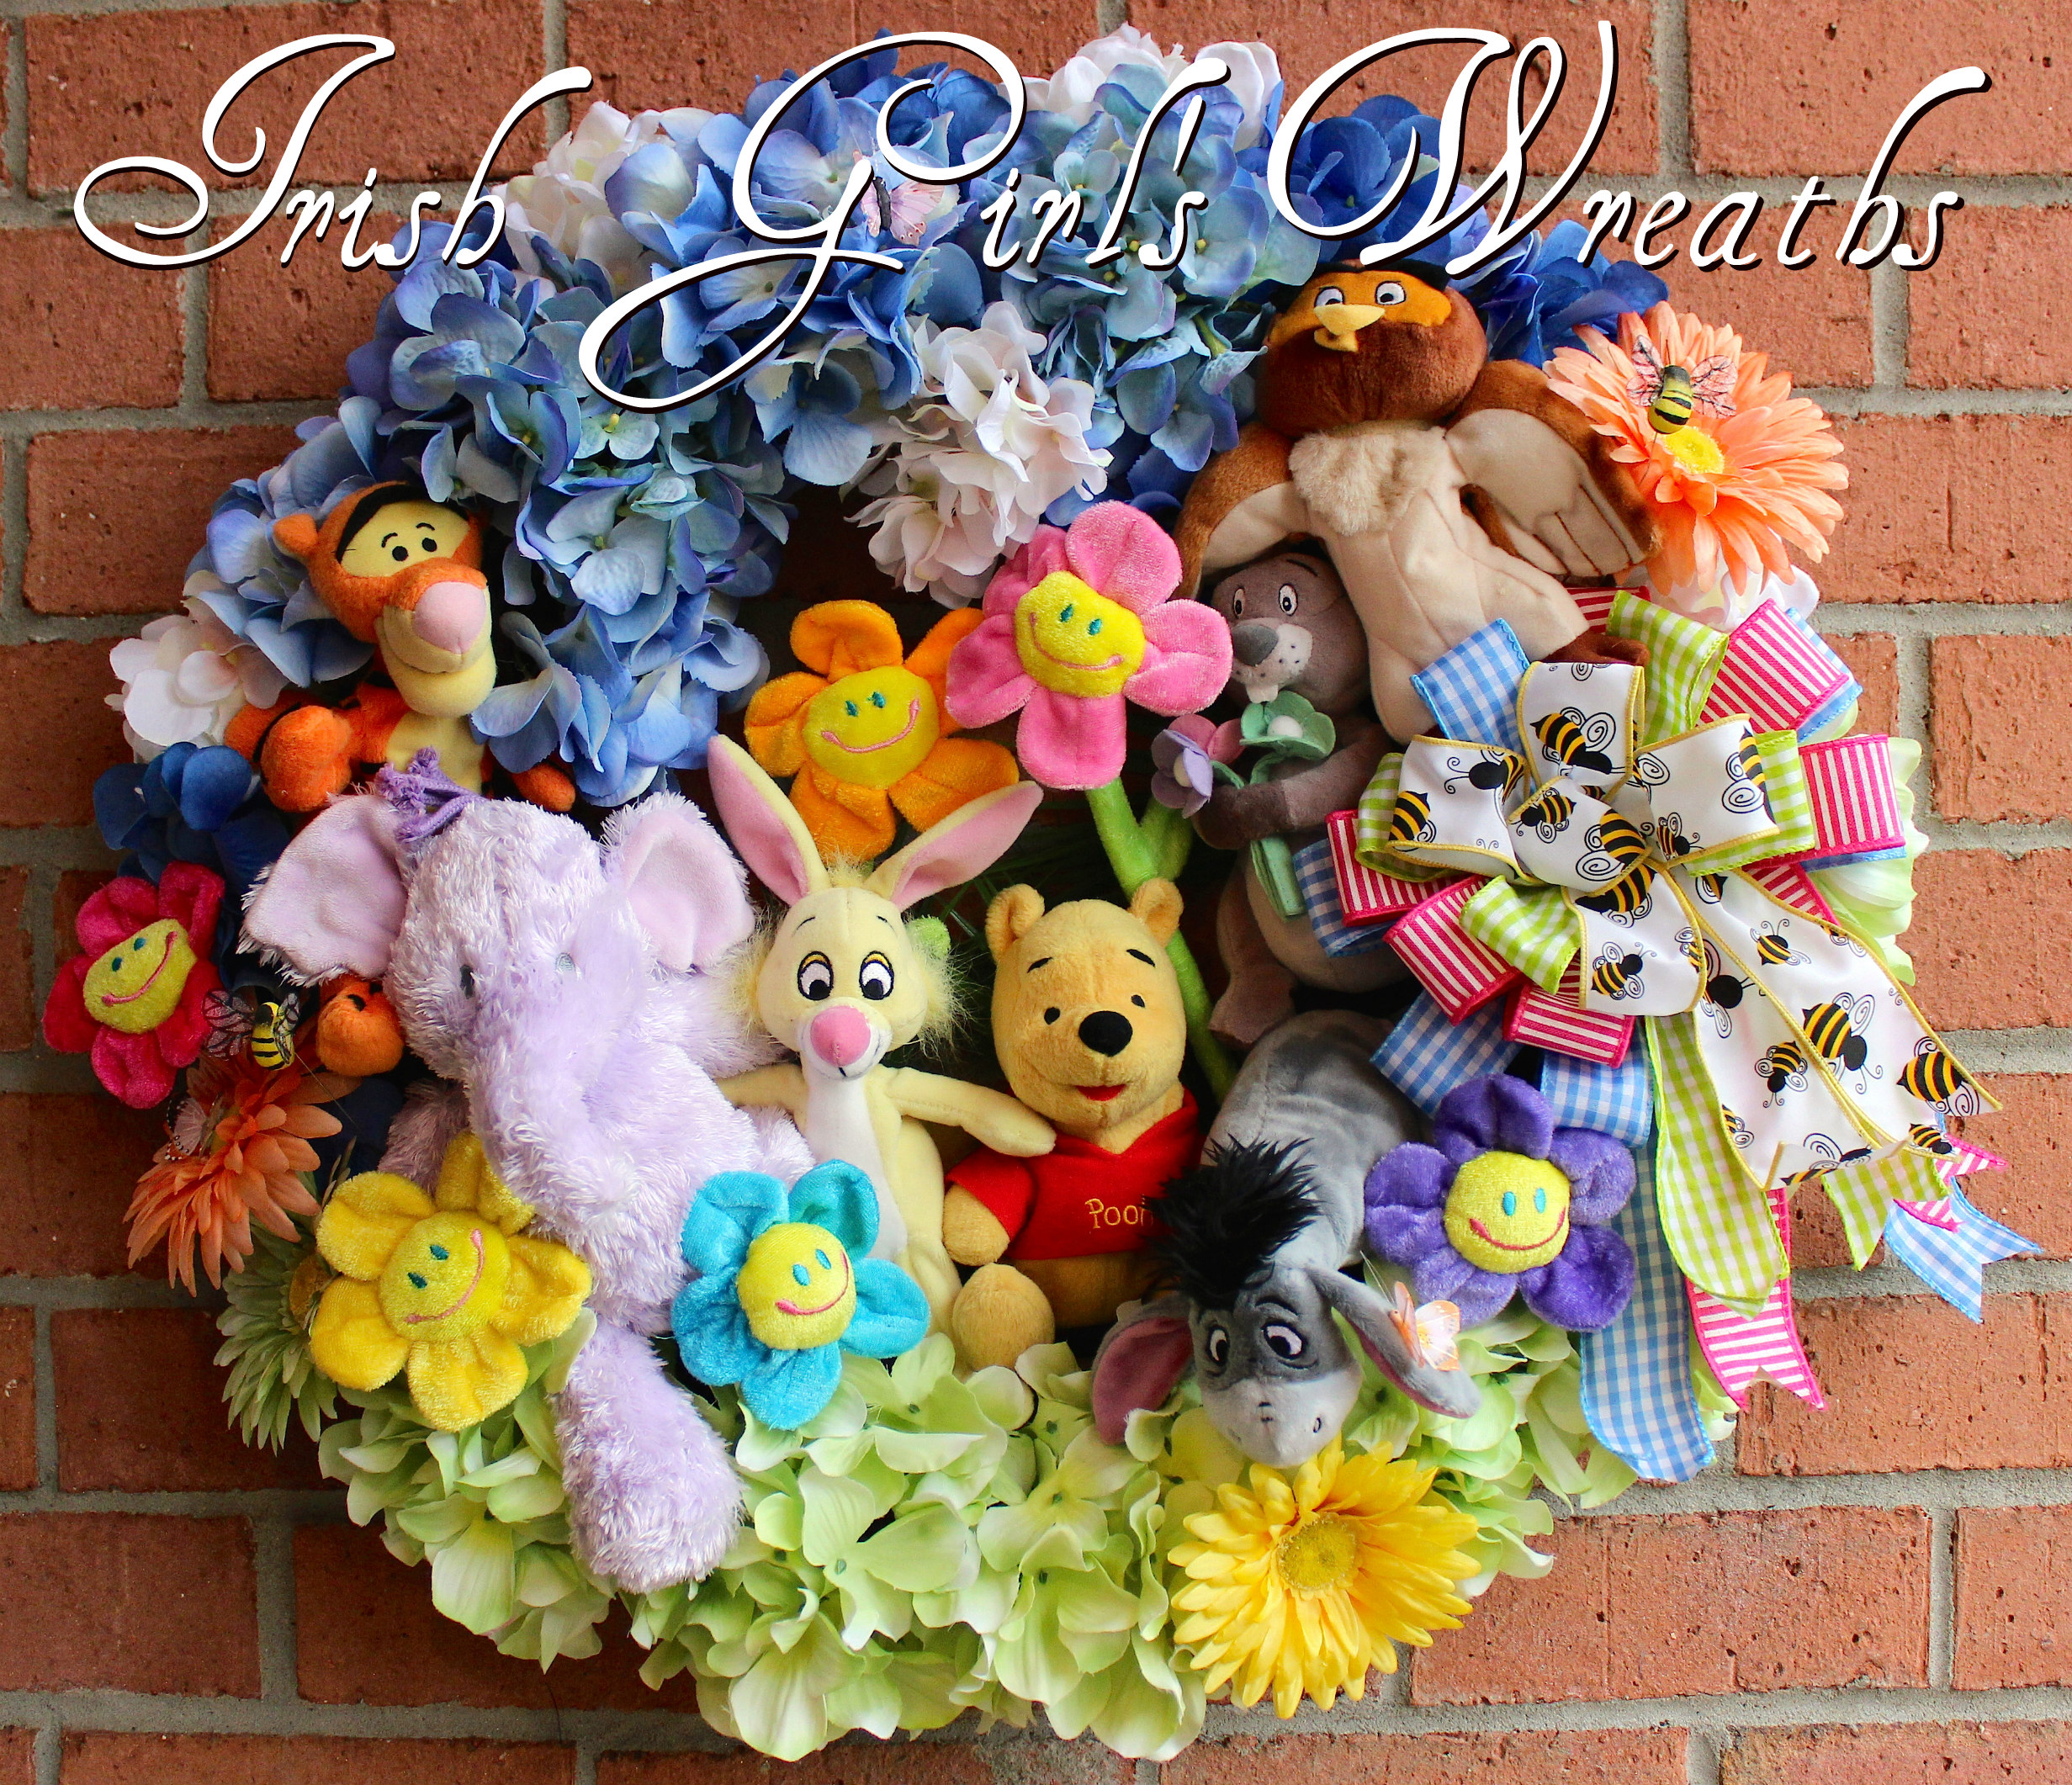 Winnie the Pooh and Friends Wreath, Custom for Joan